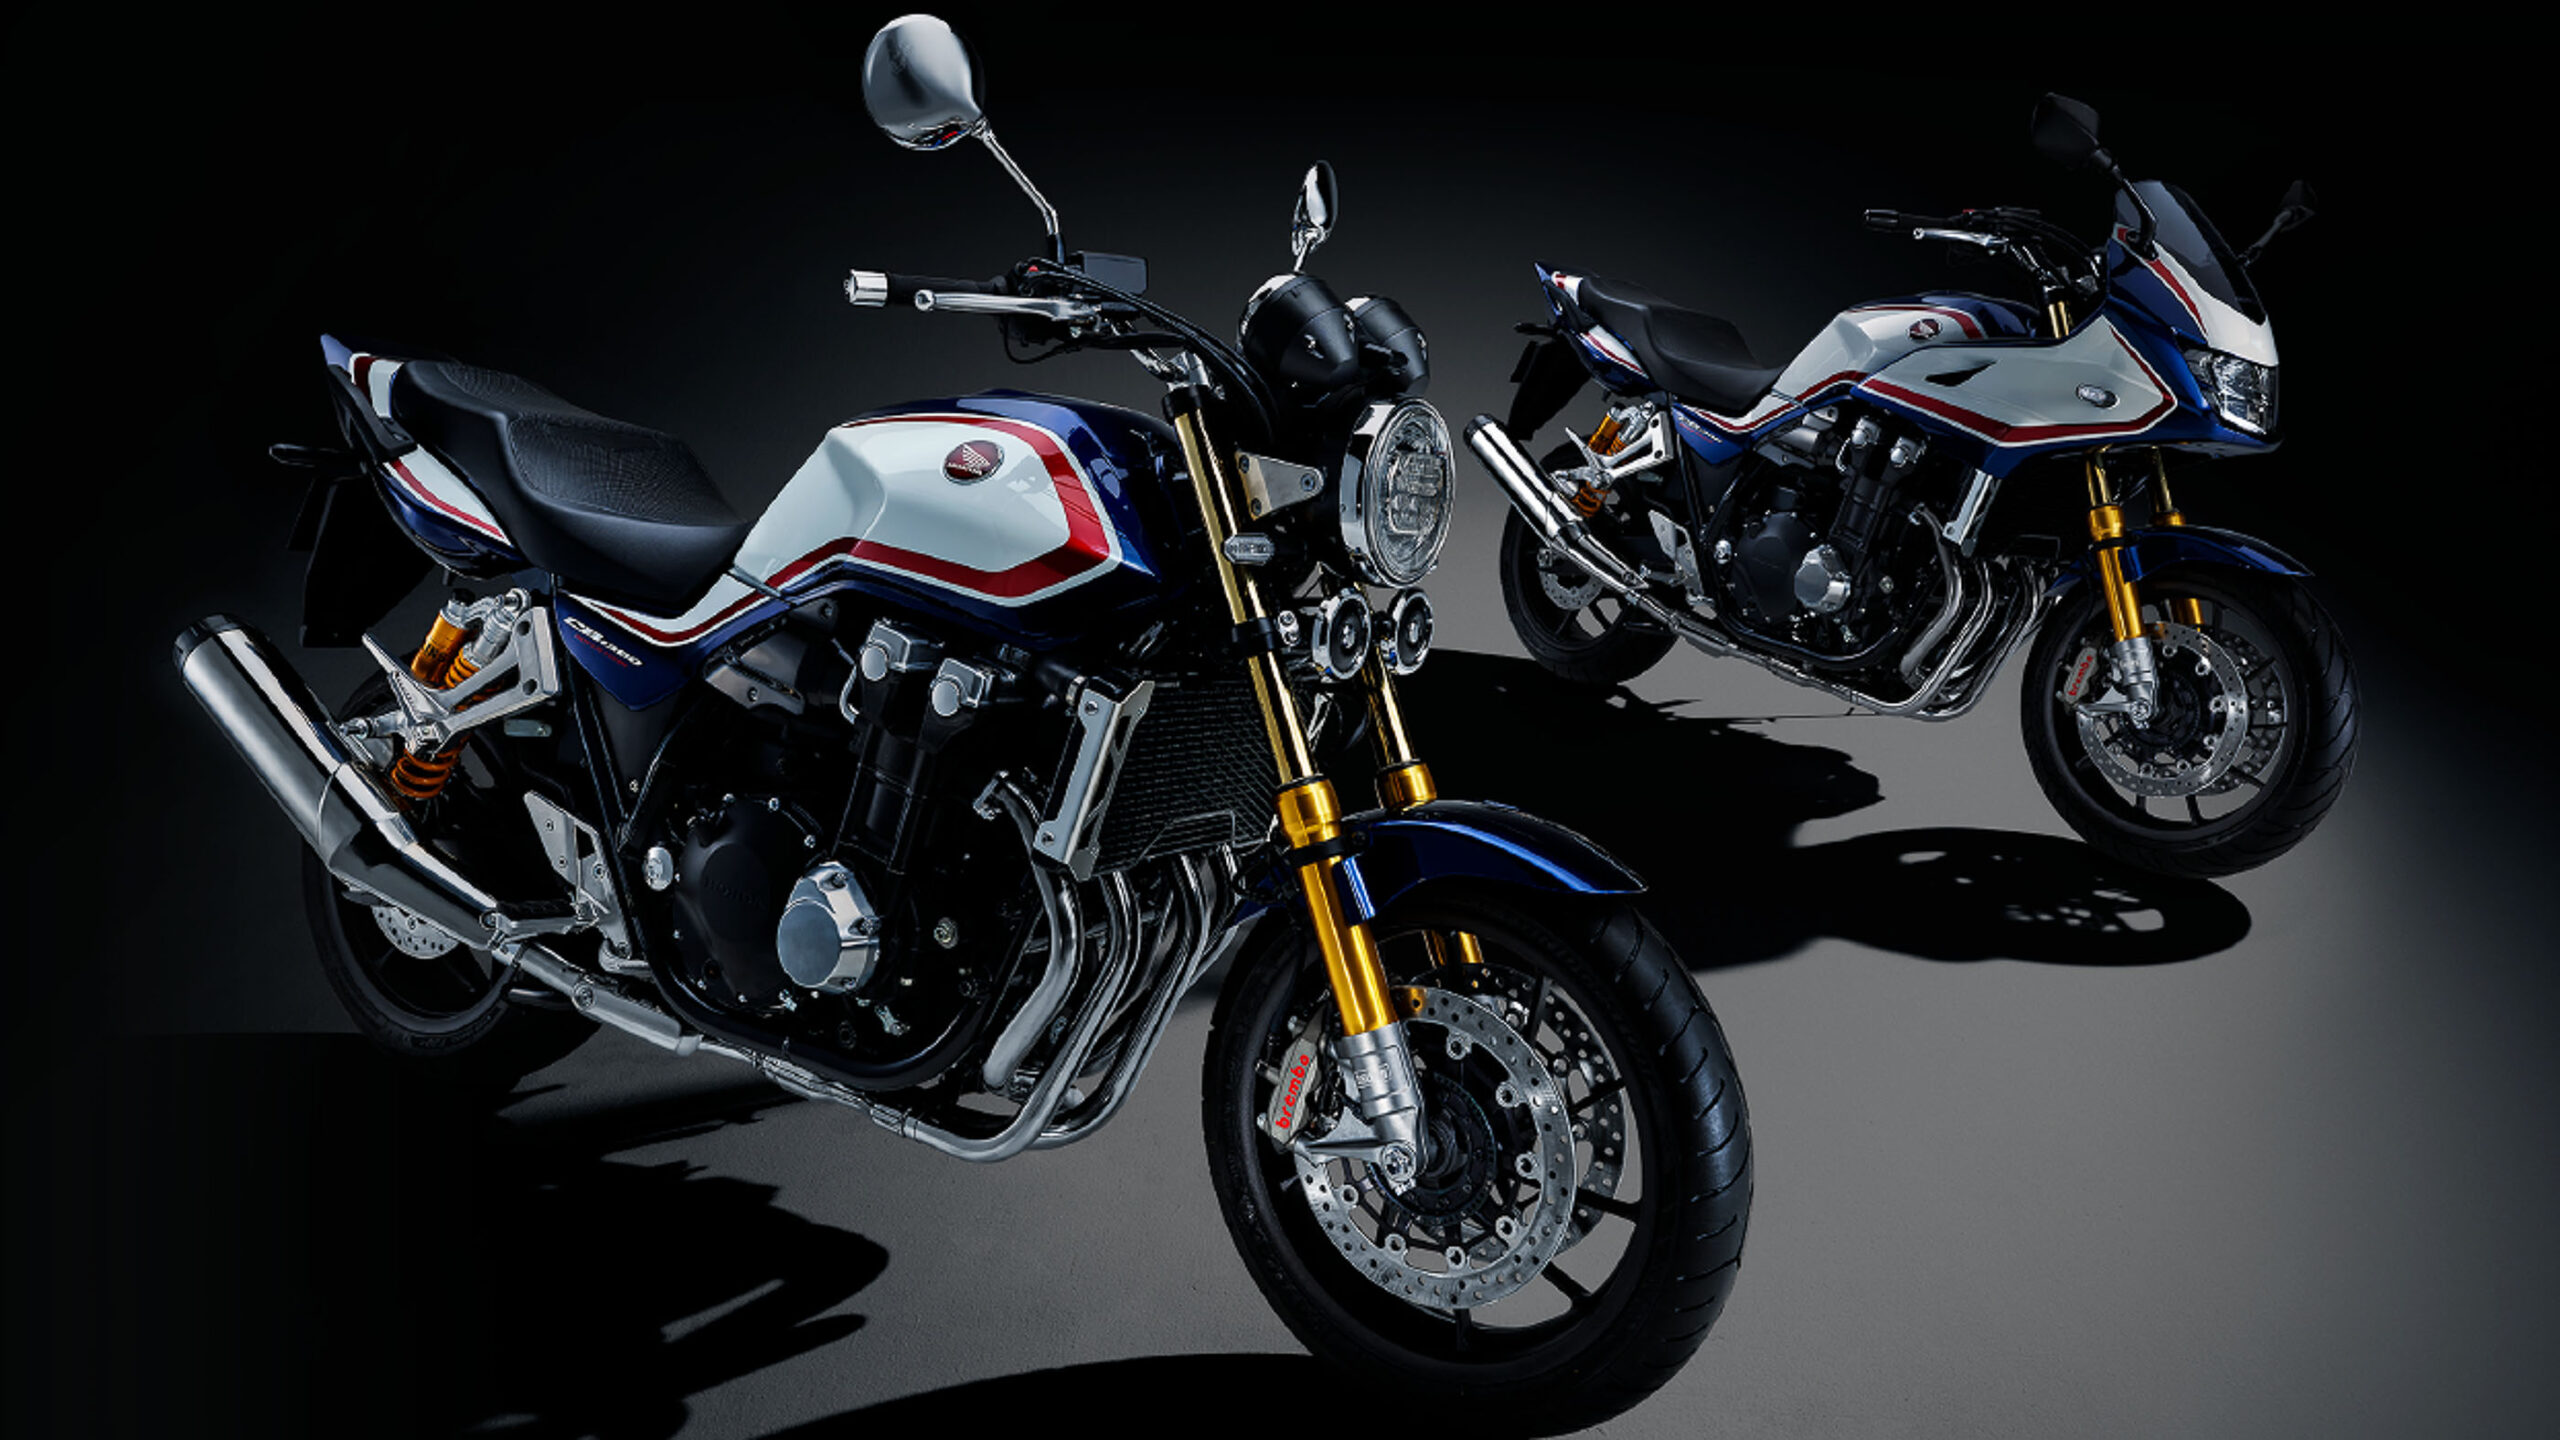 Honda CB 1300 Super Four SP und Super Bol d'Or SP Modelljahr 2019